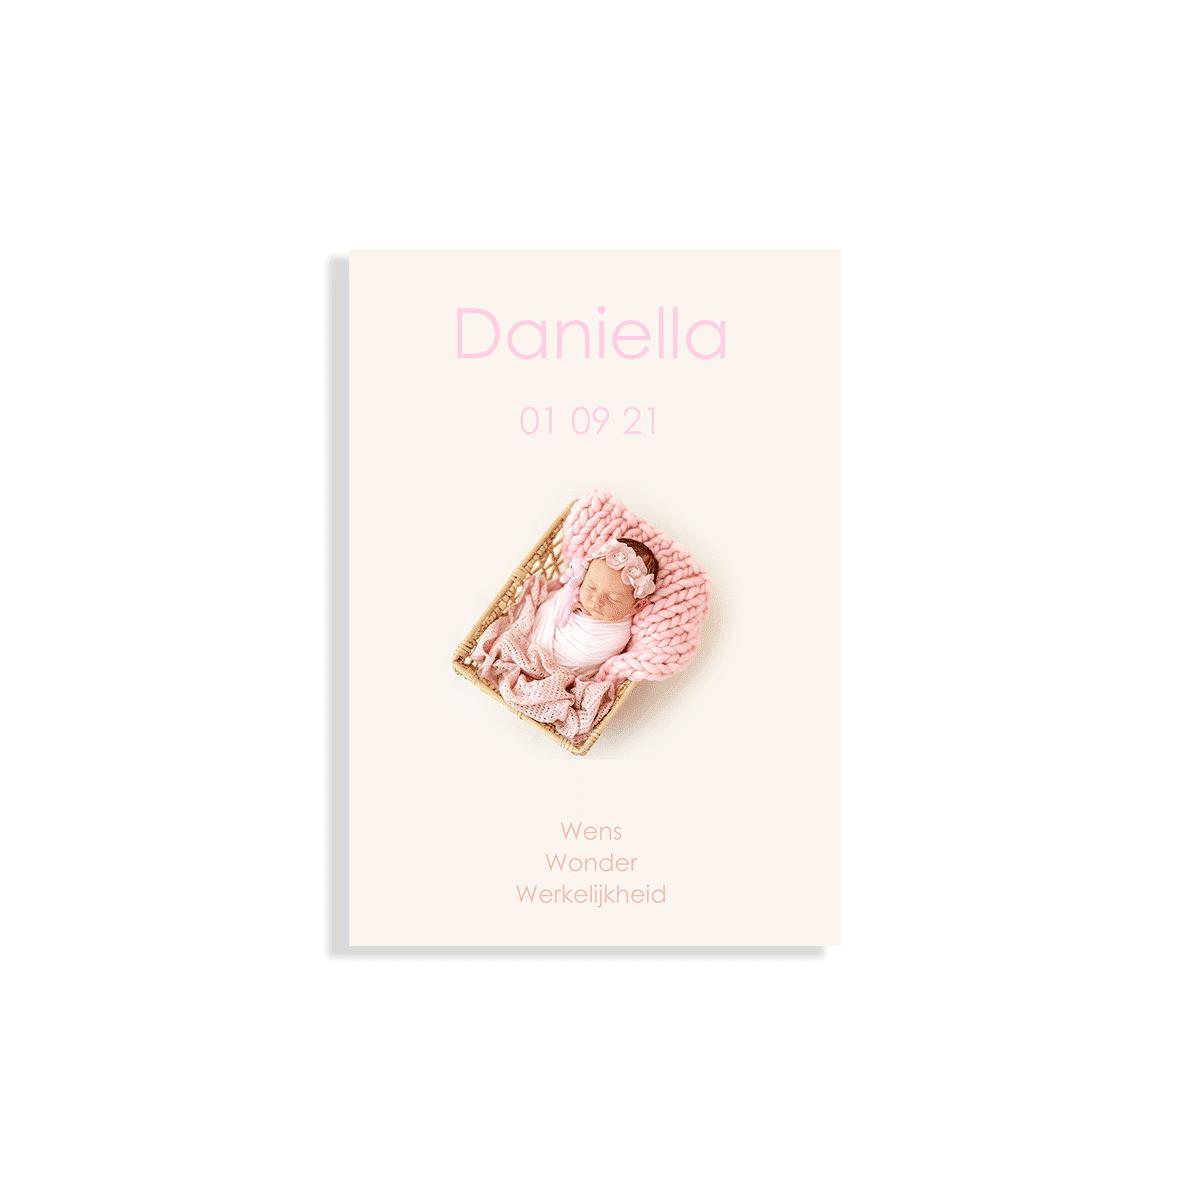 Geboortekaartje meisje zacht roze voorzijde